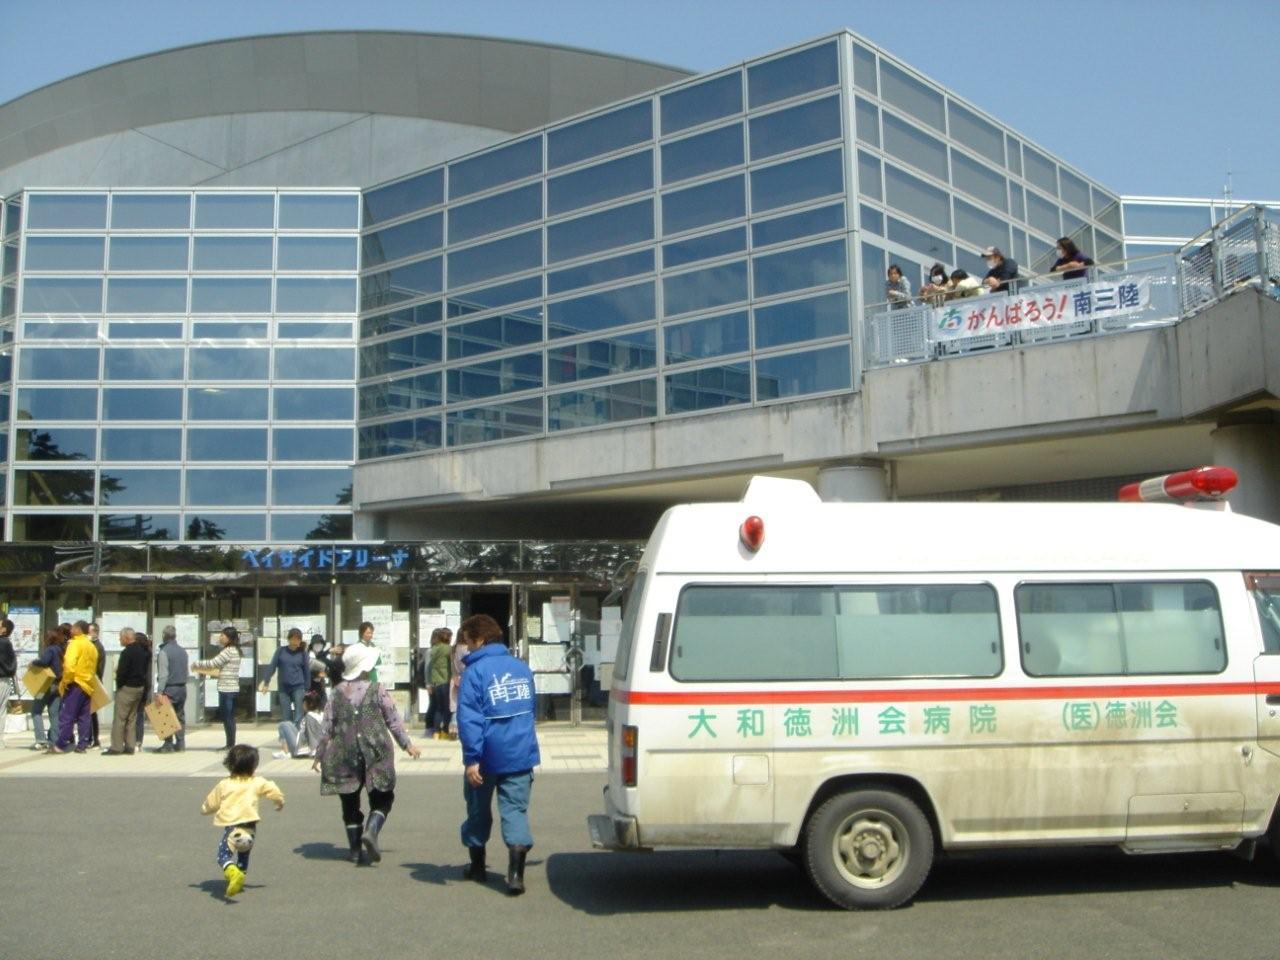 9_Minami_Sanriku_Bayside_Arena